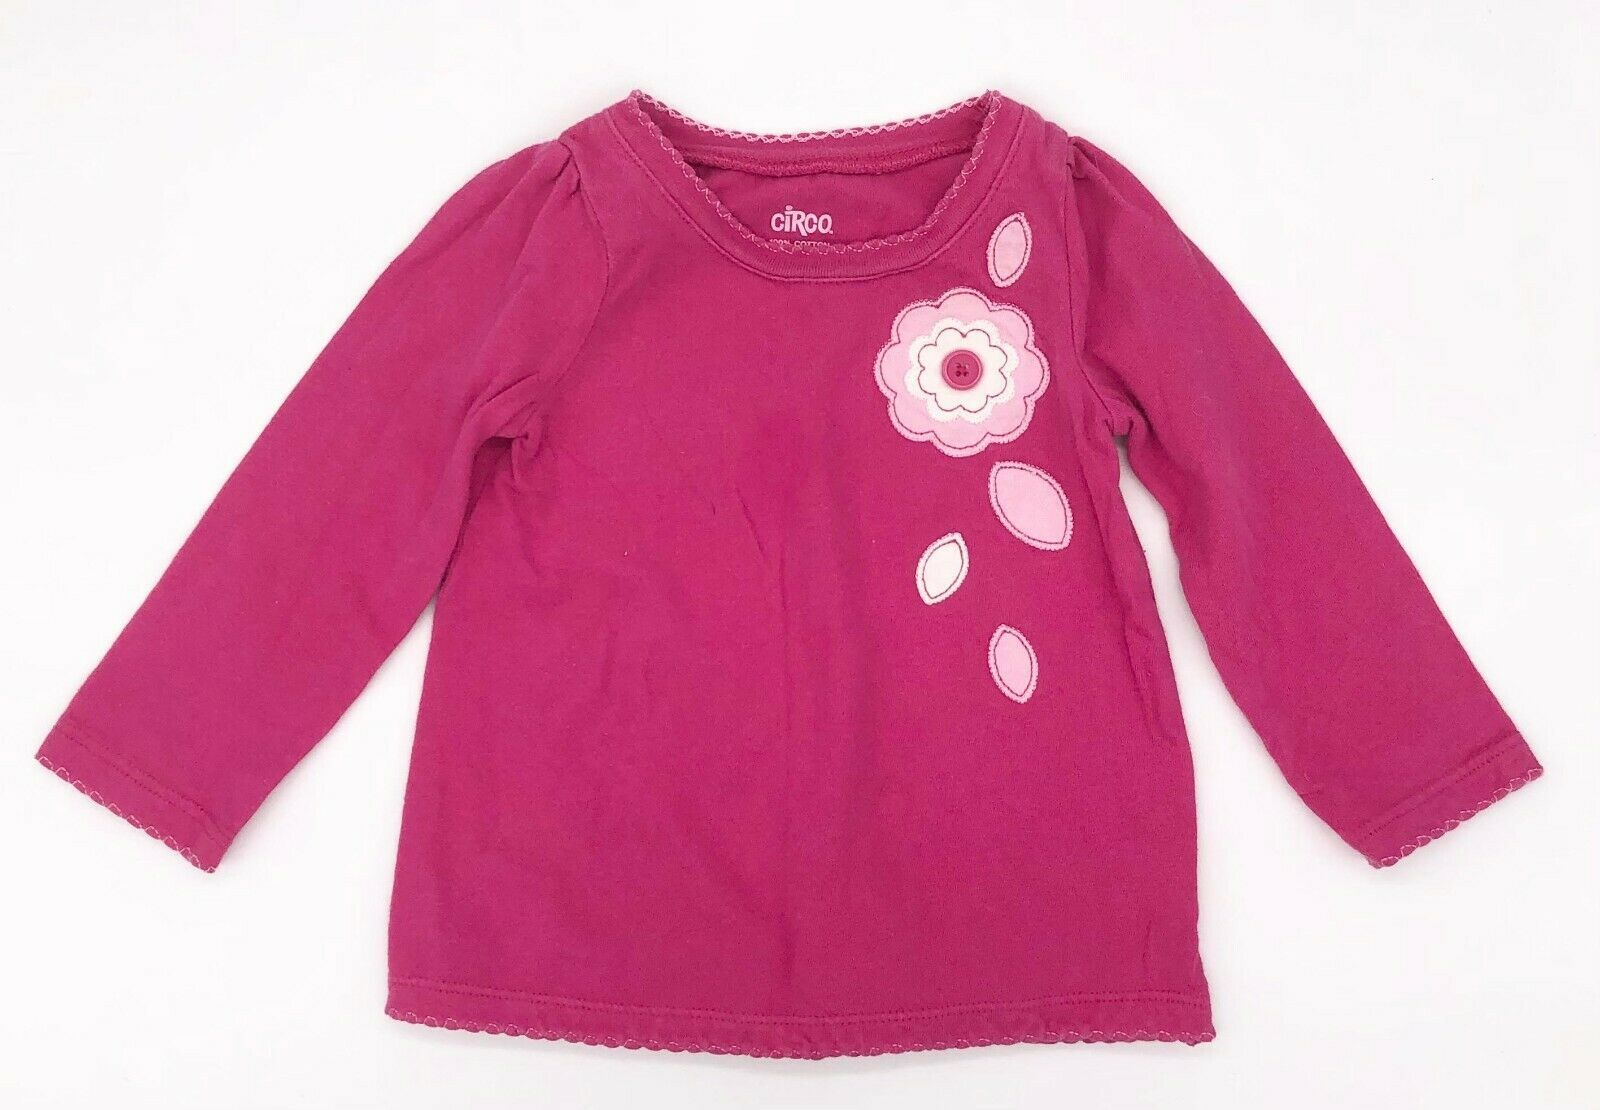 Circo Girls Size 12M Long Sleeve Top Pink w/ Flowers, 100% Cotton - $1.98